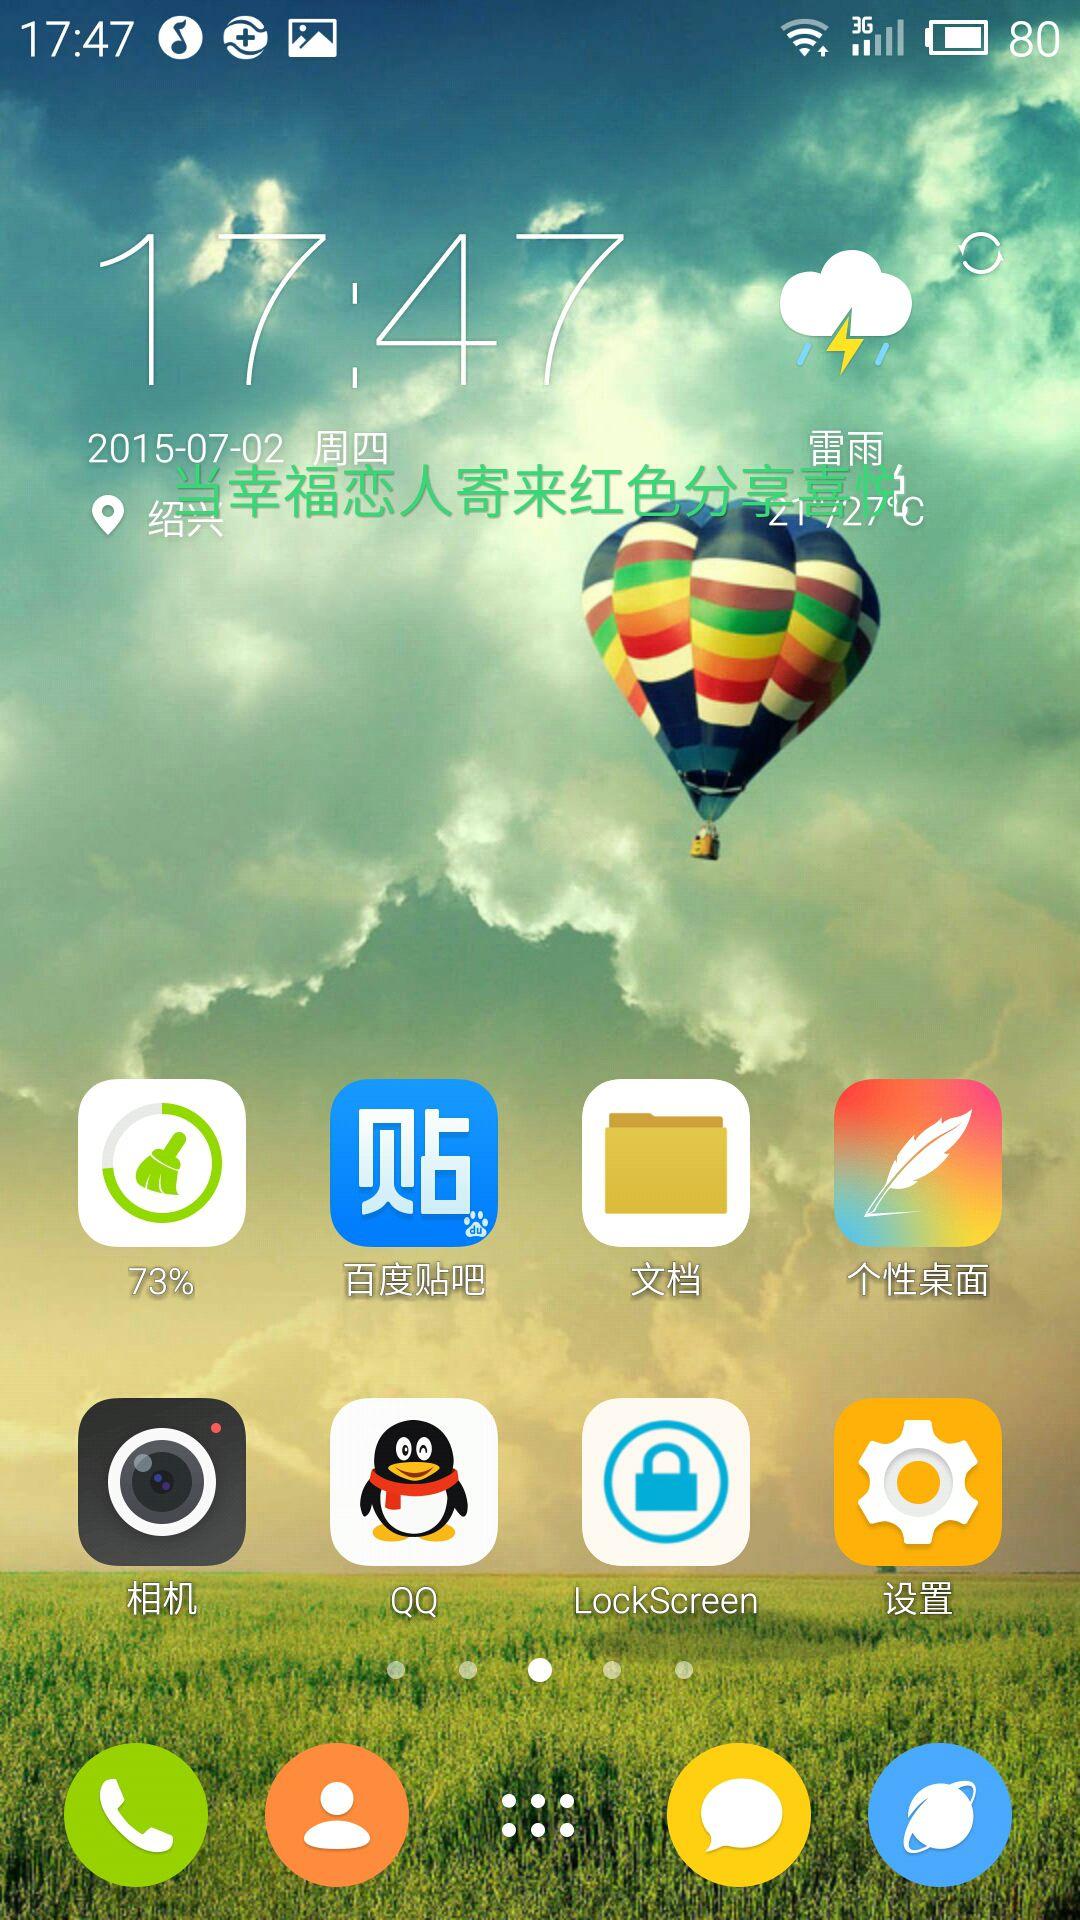 note为什么手机最上面不会显示QQ图标 已经设置显示栏显示QQ图标图片